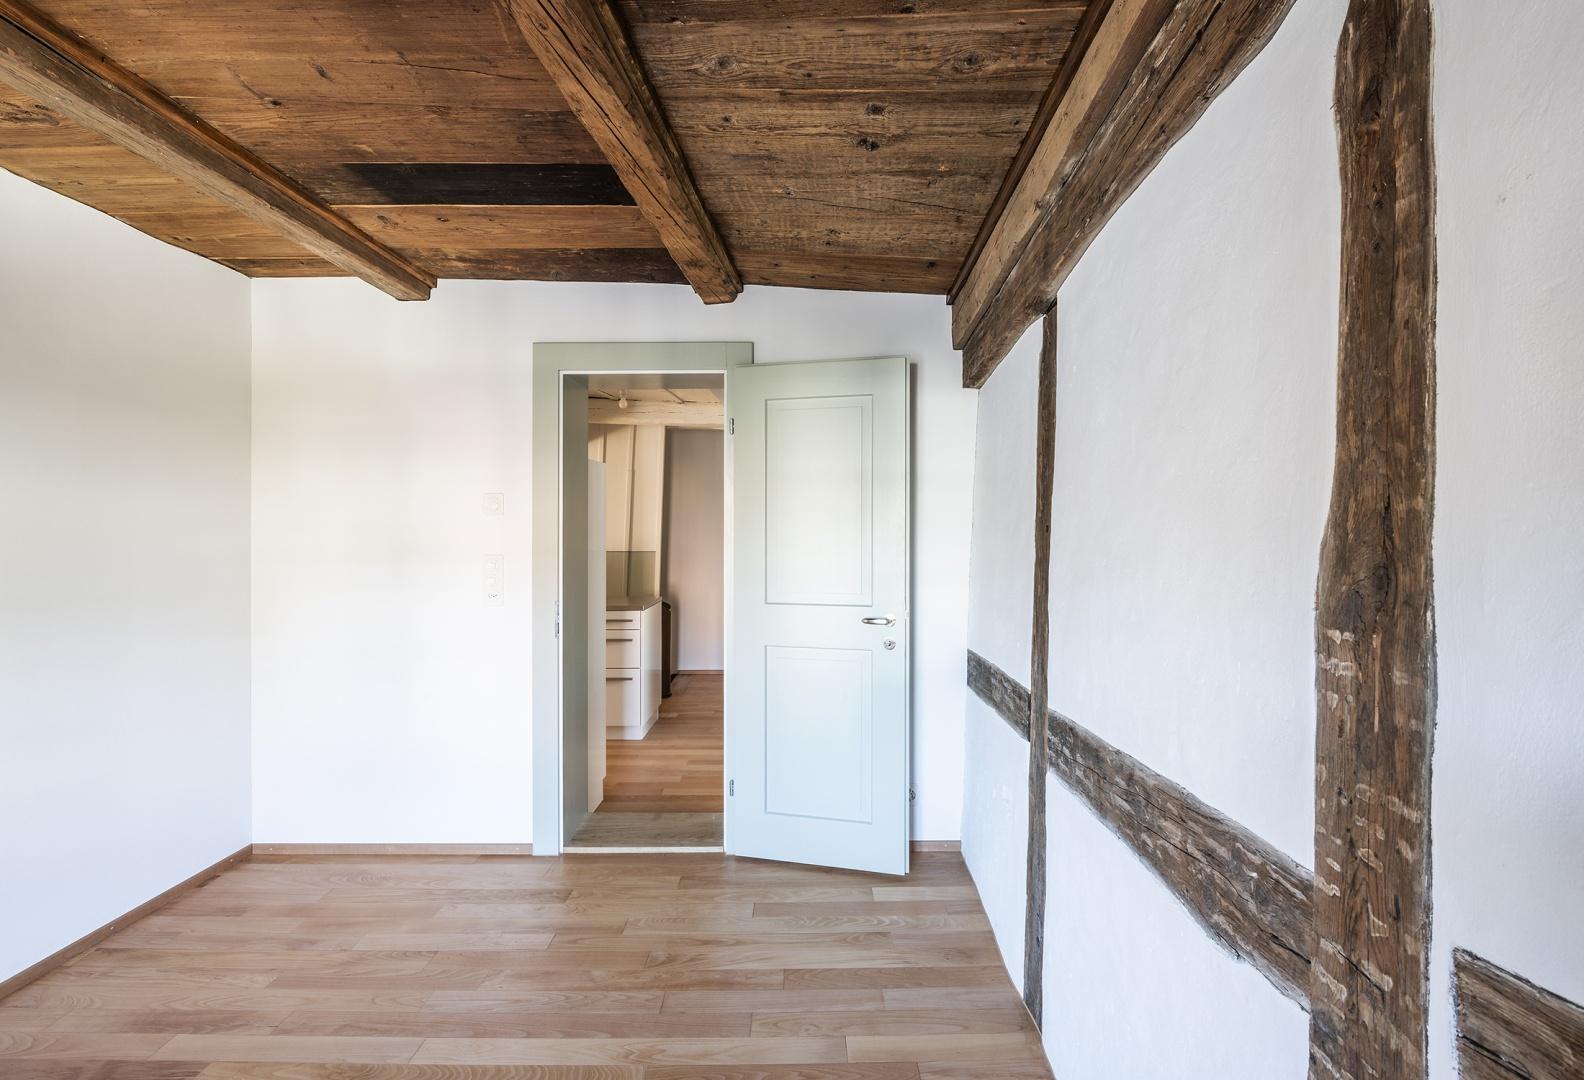 © Regine Giesecke, Zug / Röösli Architekten AG